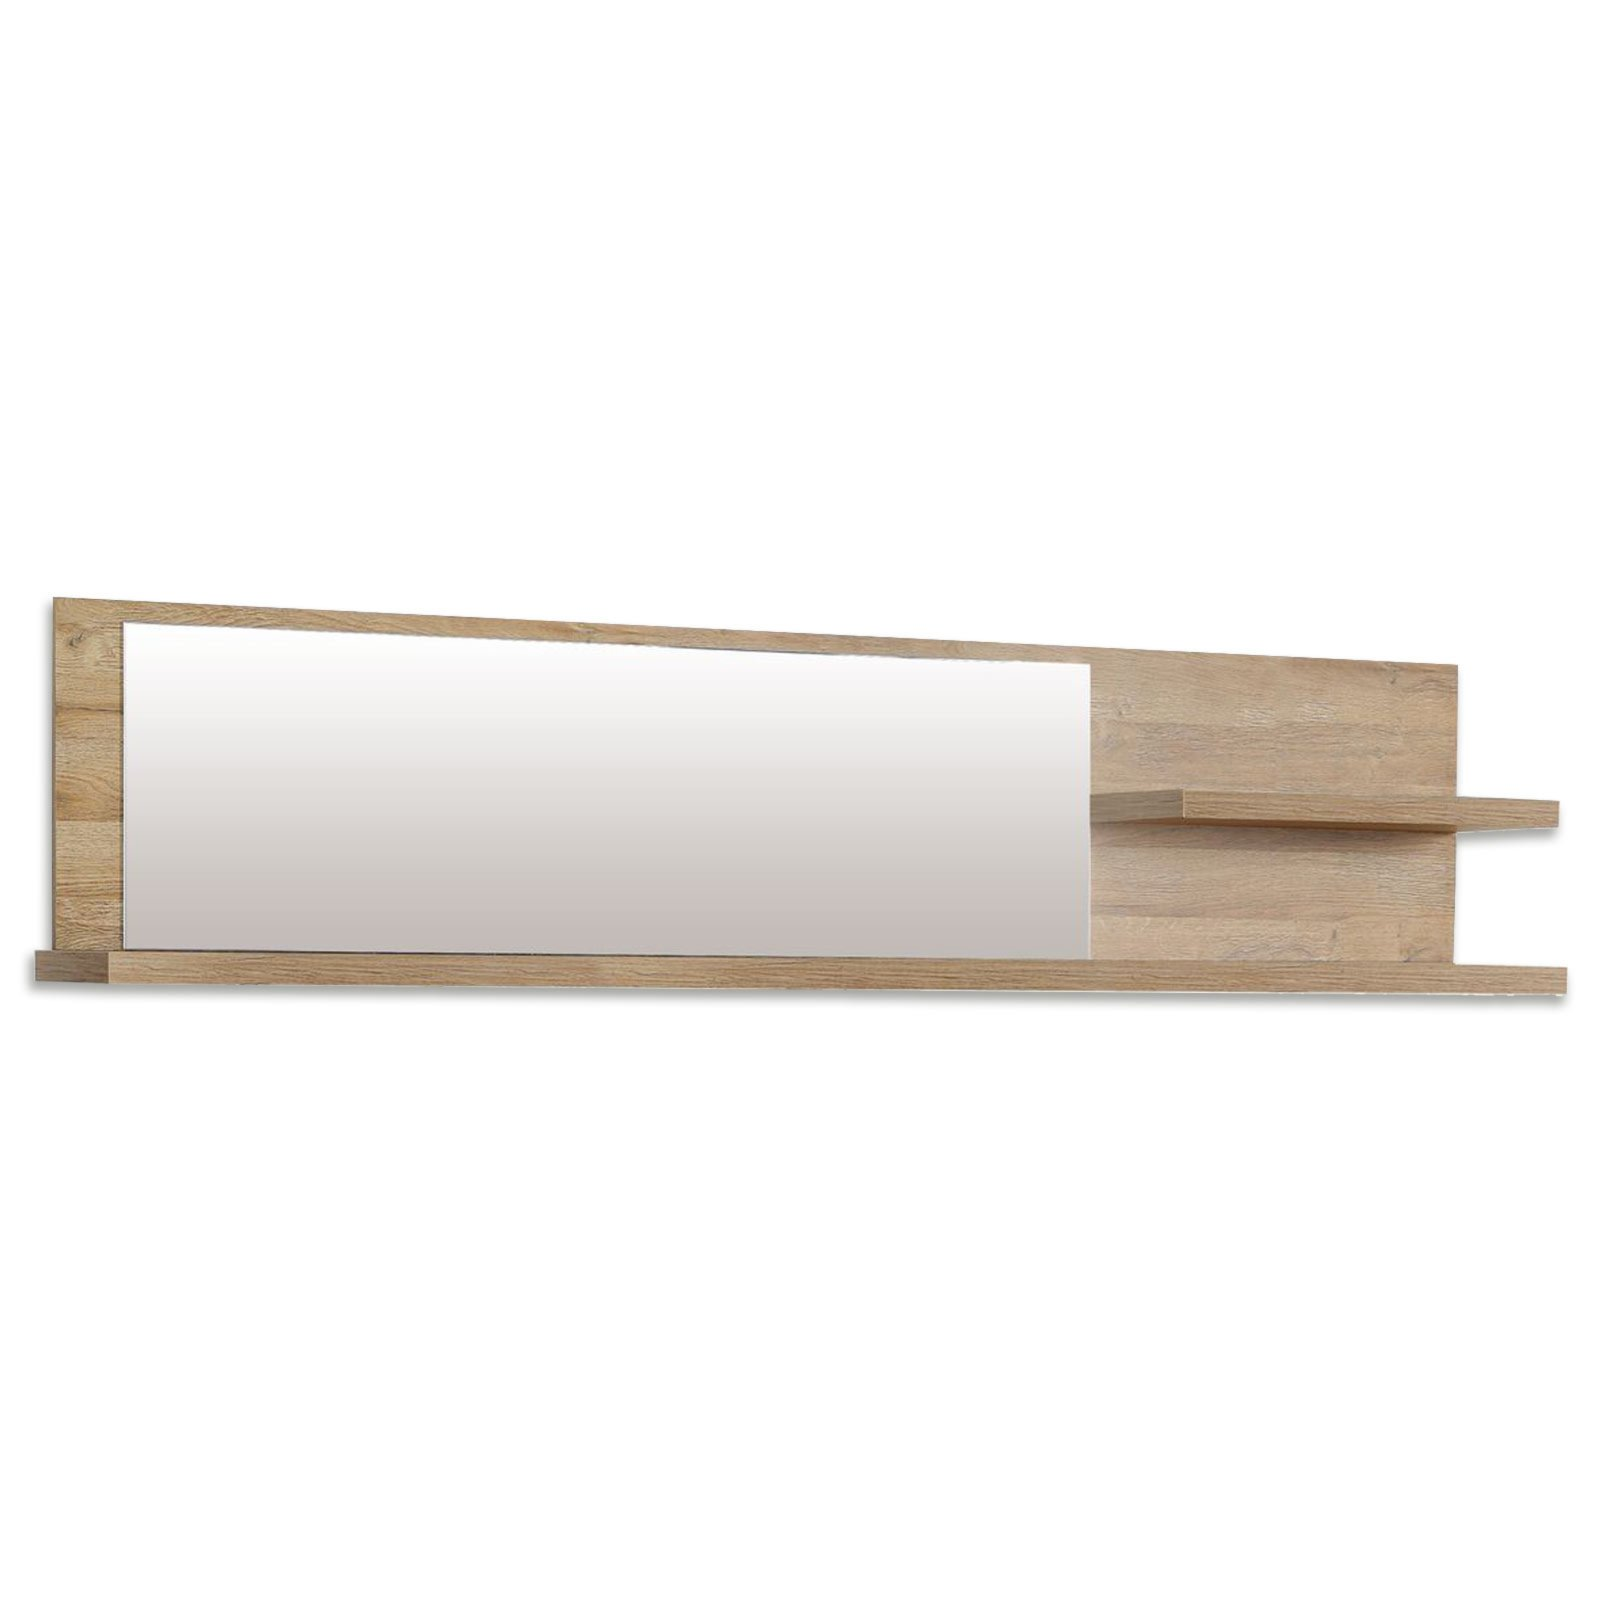 wandregal corona alteiche 213 cm breit wandregale. Black Bedroom Furniture Sets. Home Design Ideas